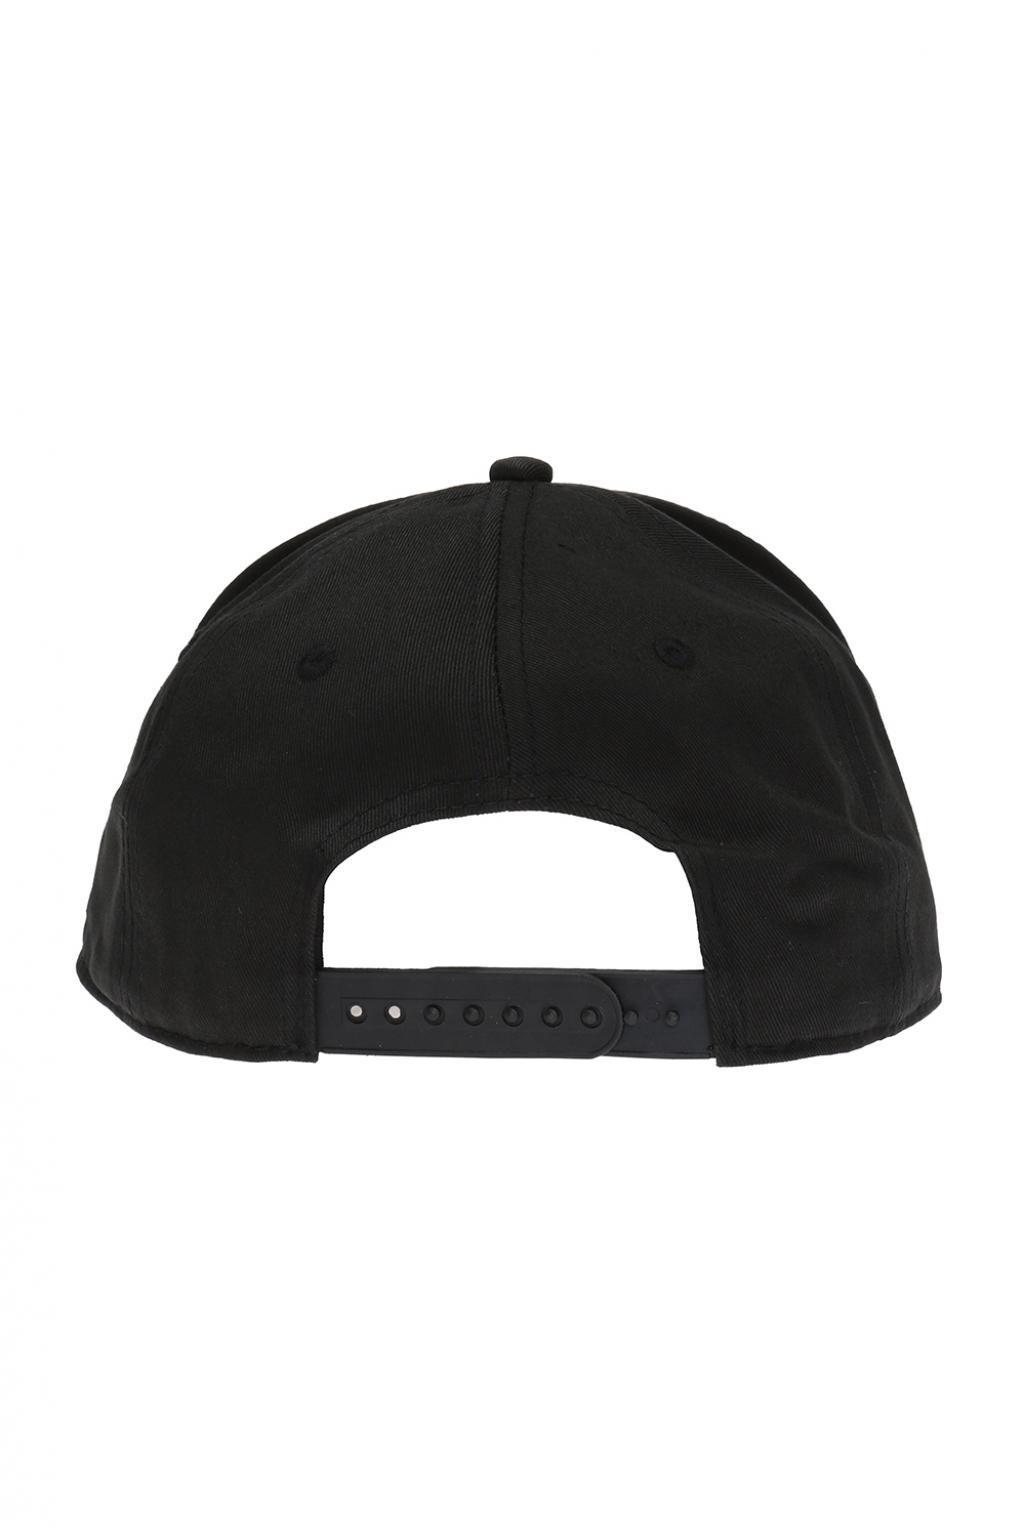 ffa1bf849 Lyst - Mcq Alexander Mcqueen Swallow Motif Baseball Cap in Black for Men